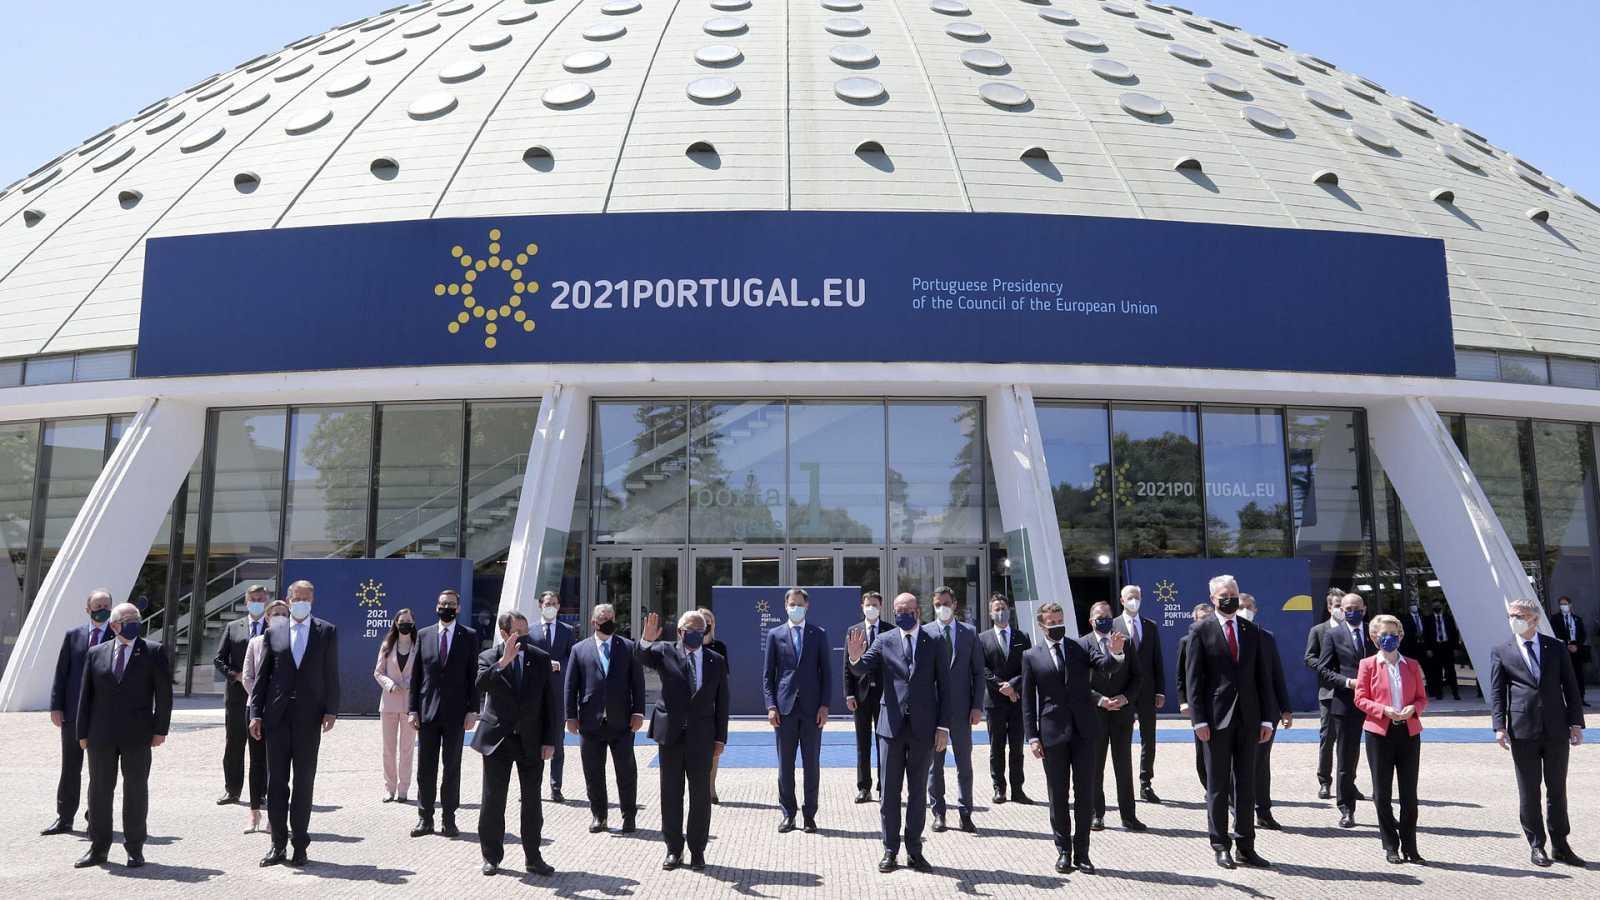 Europa abierta - Se presenta en Oporto la Europa social del futuro - escuchar ahora